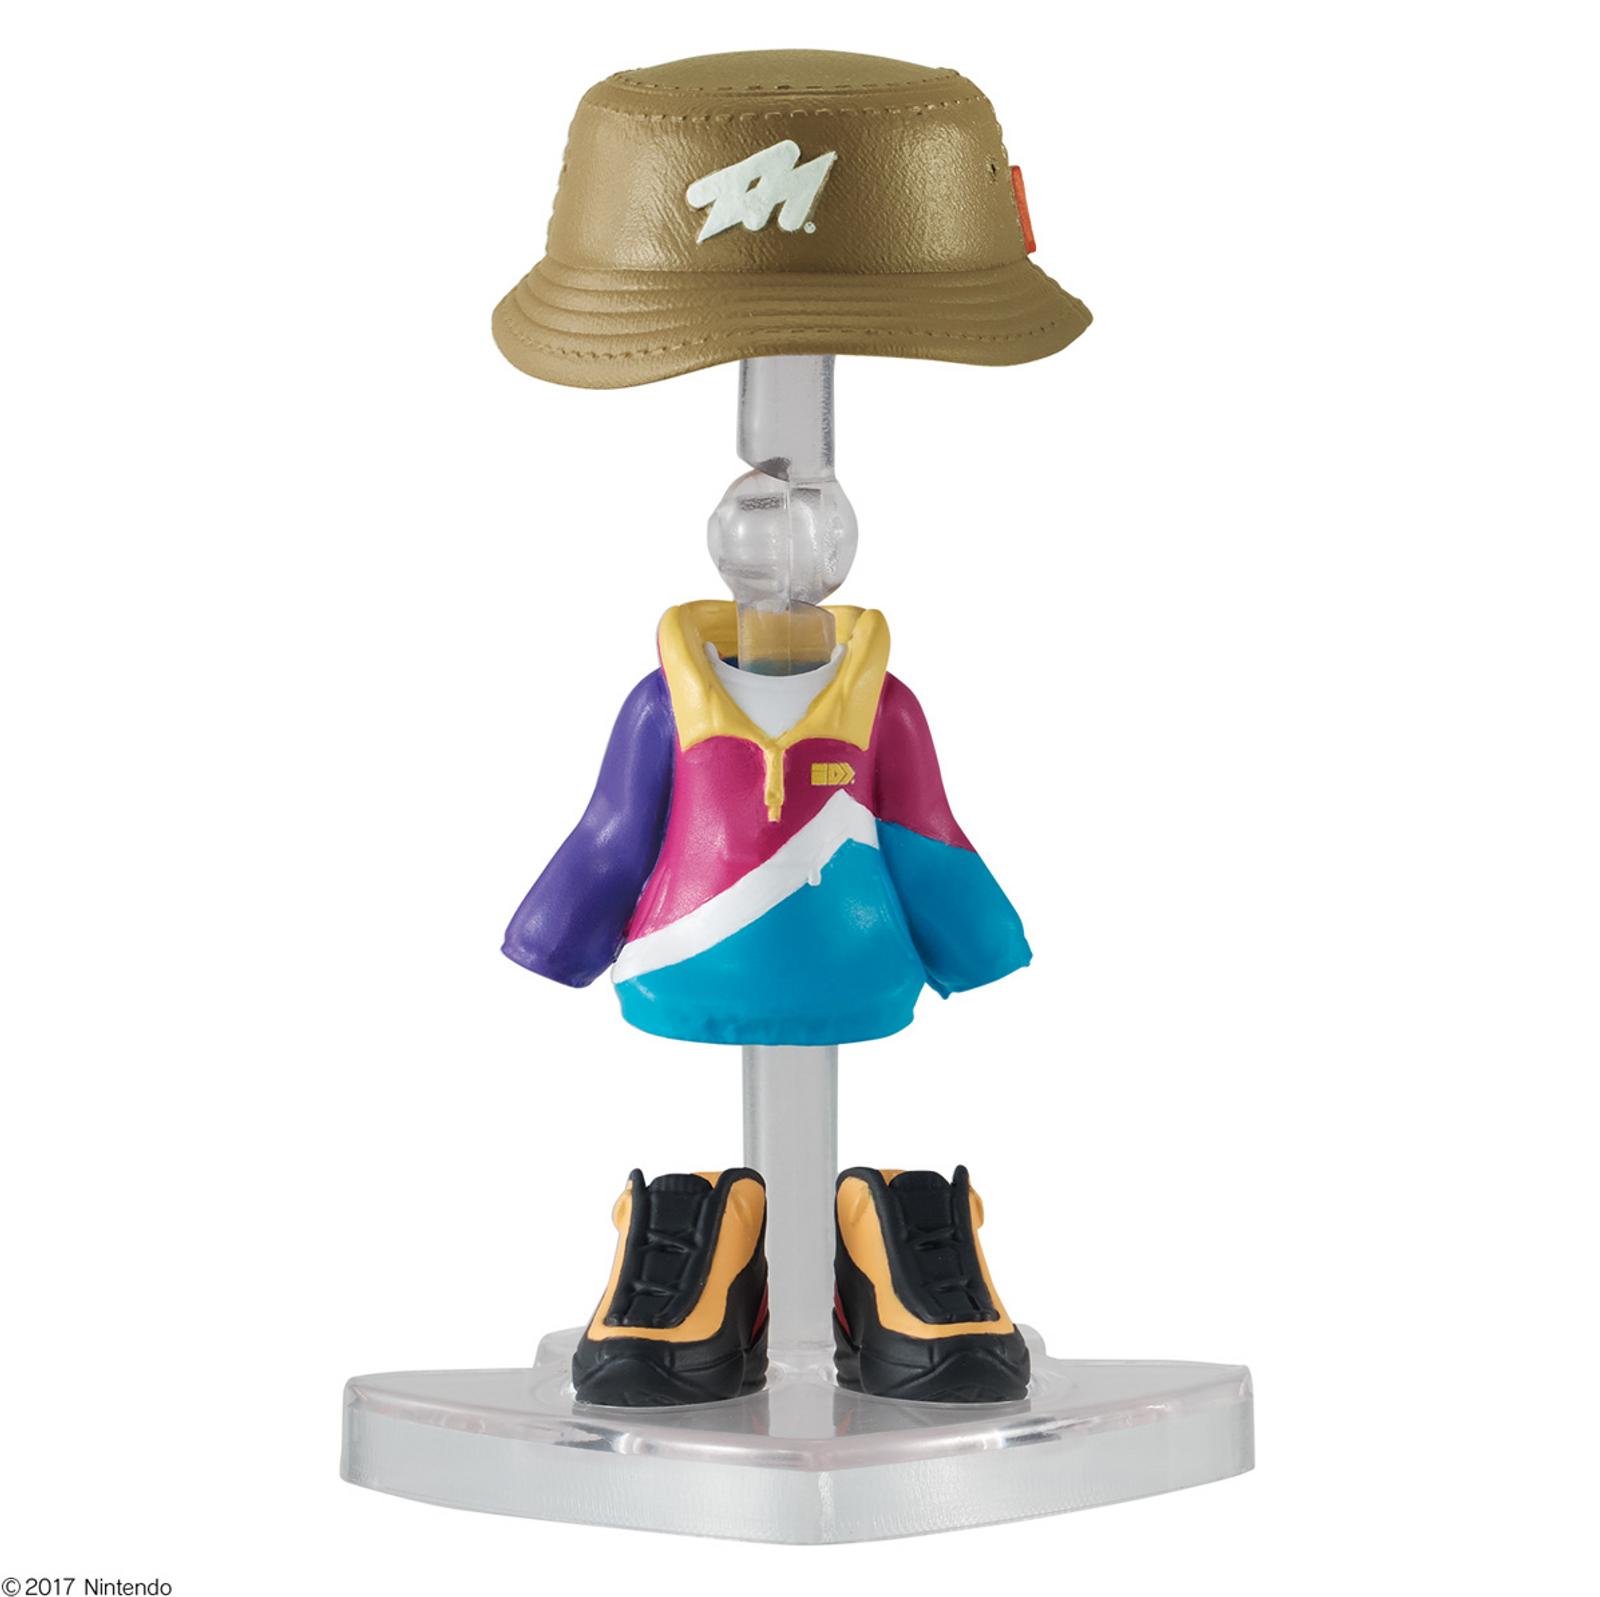 Splatoon 2 Dress-up Figure Gear Collection 2 GEAR Set #11 JAPAN Nintendo Switch